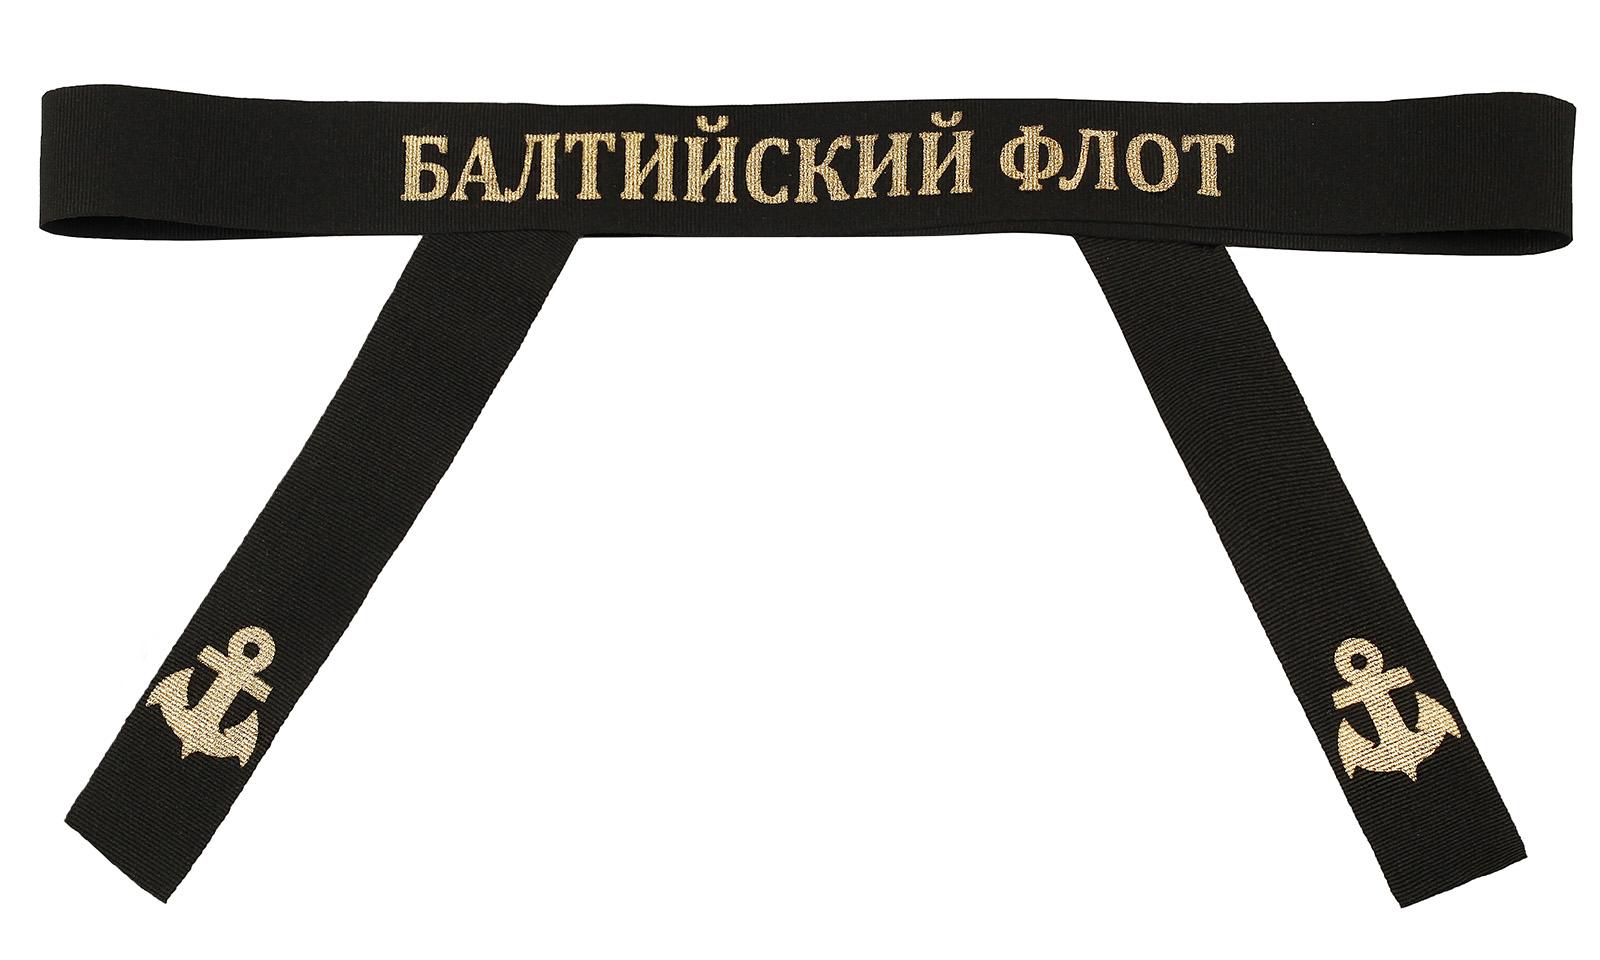 "Ленточка на бескозырку ""Балтийский флот"""